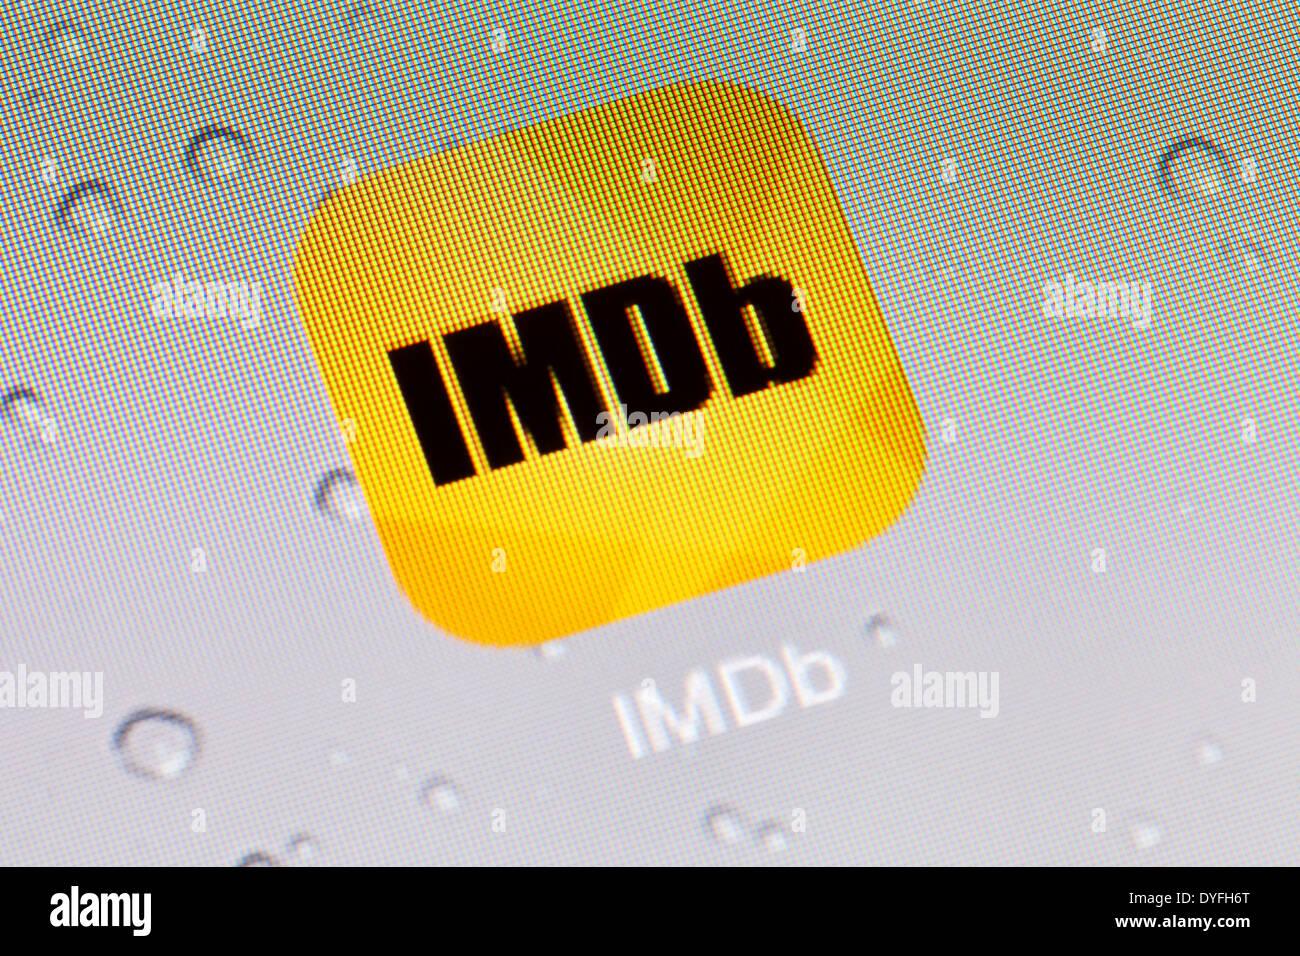 IMDb ( International Movie Database ) app logo icon on iPad